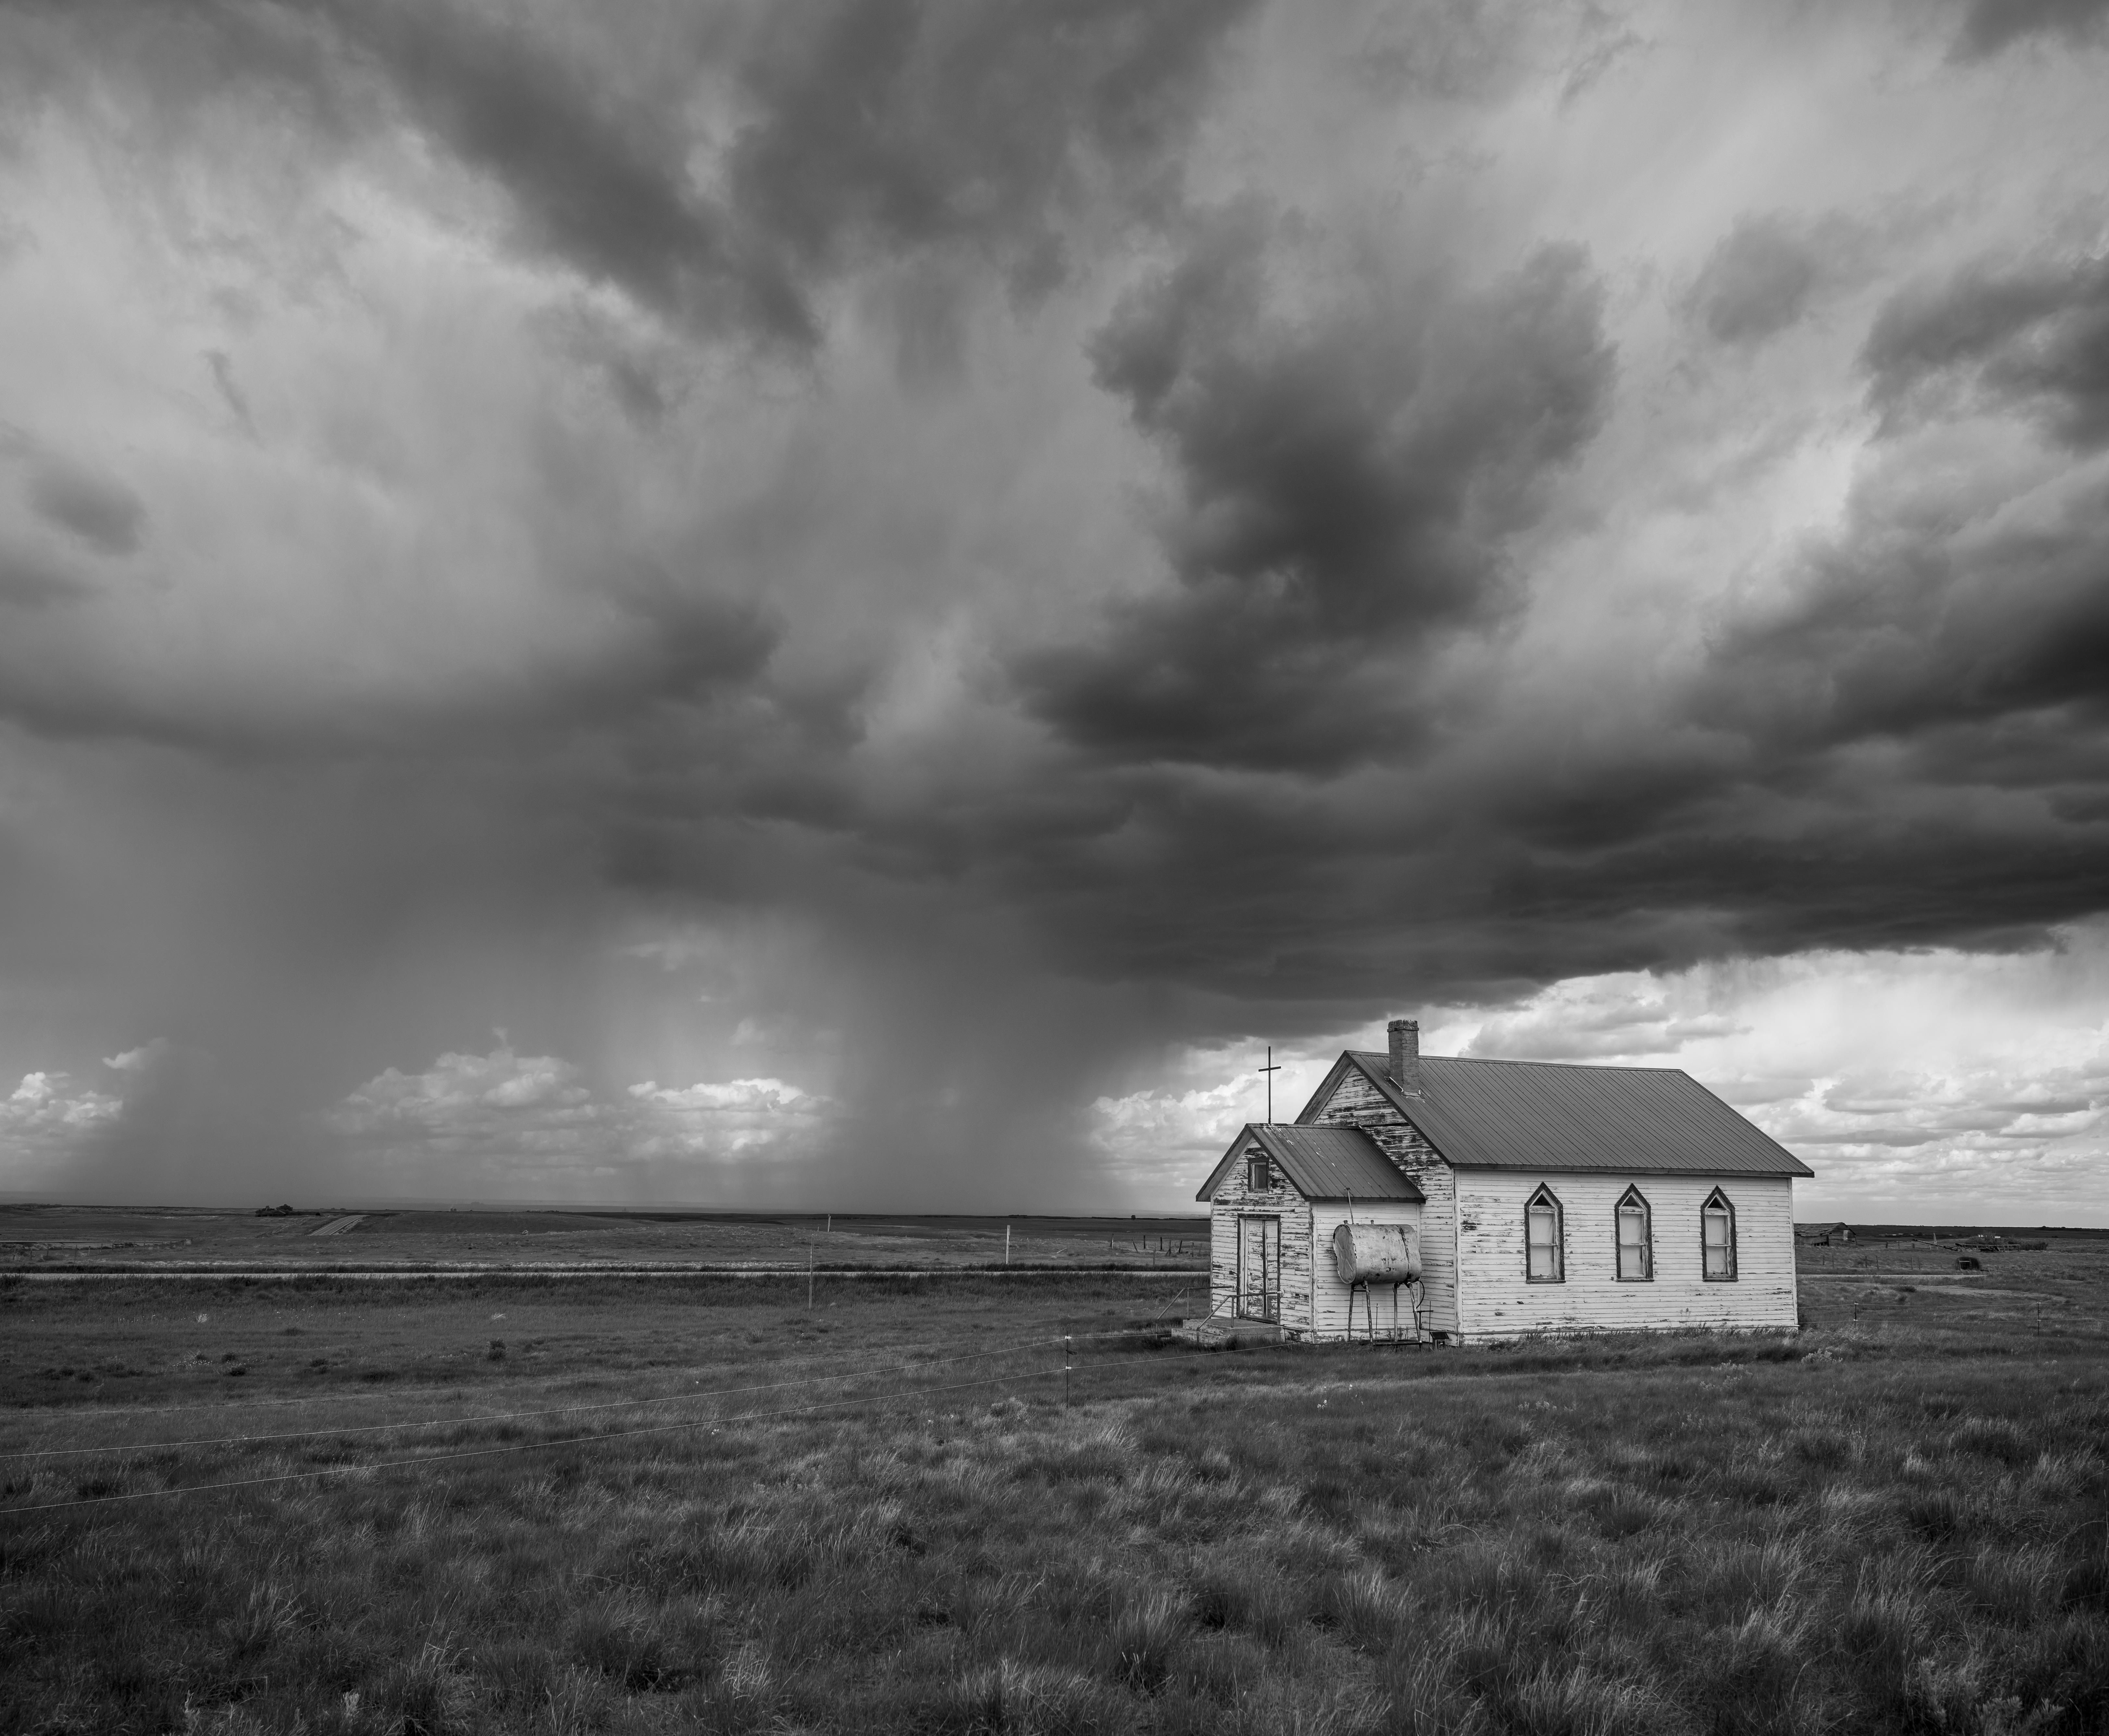 Abandoned school with an approaching storm, Saskatchewan